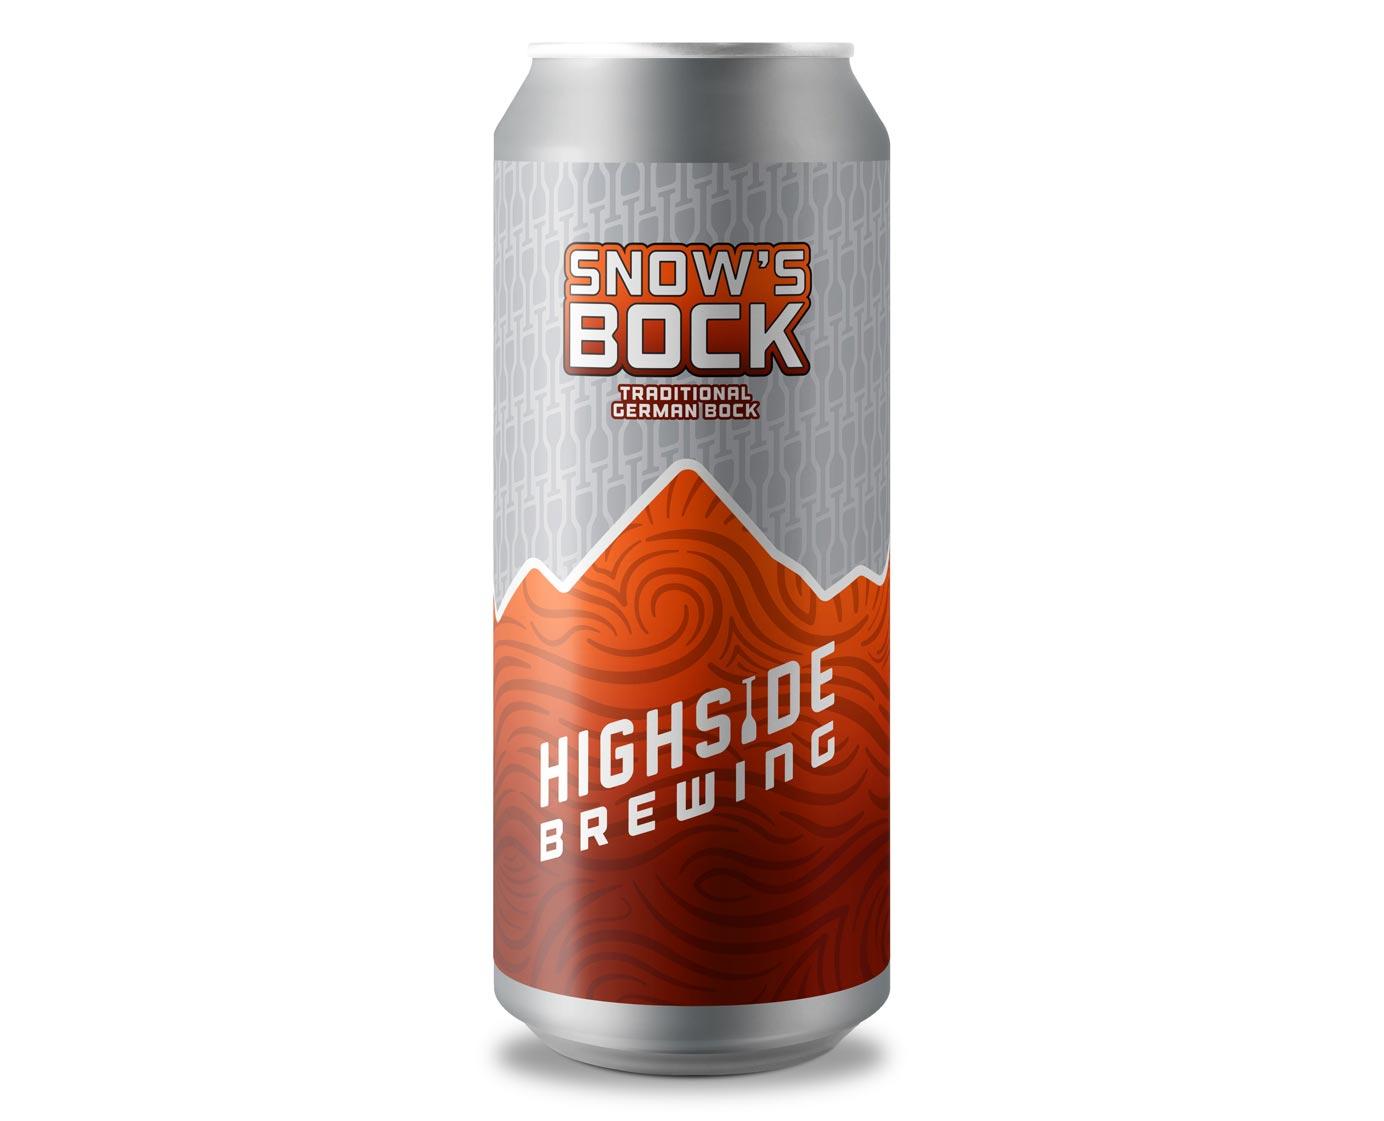 Snow's Bock